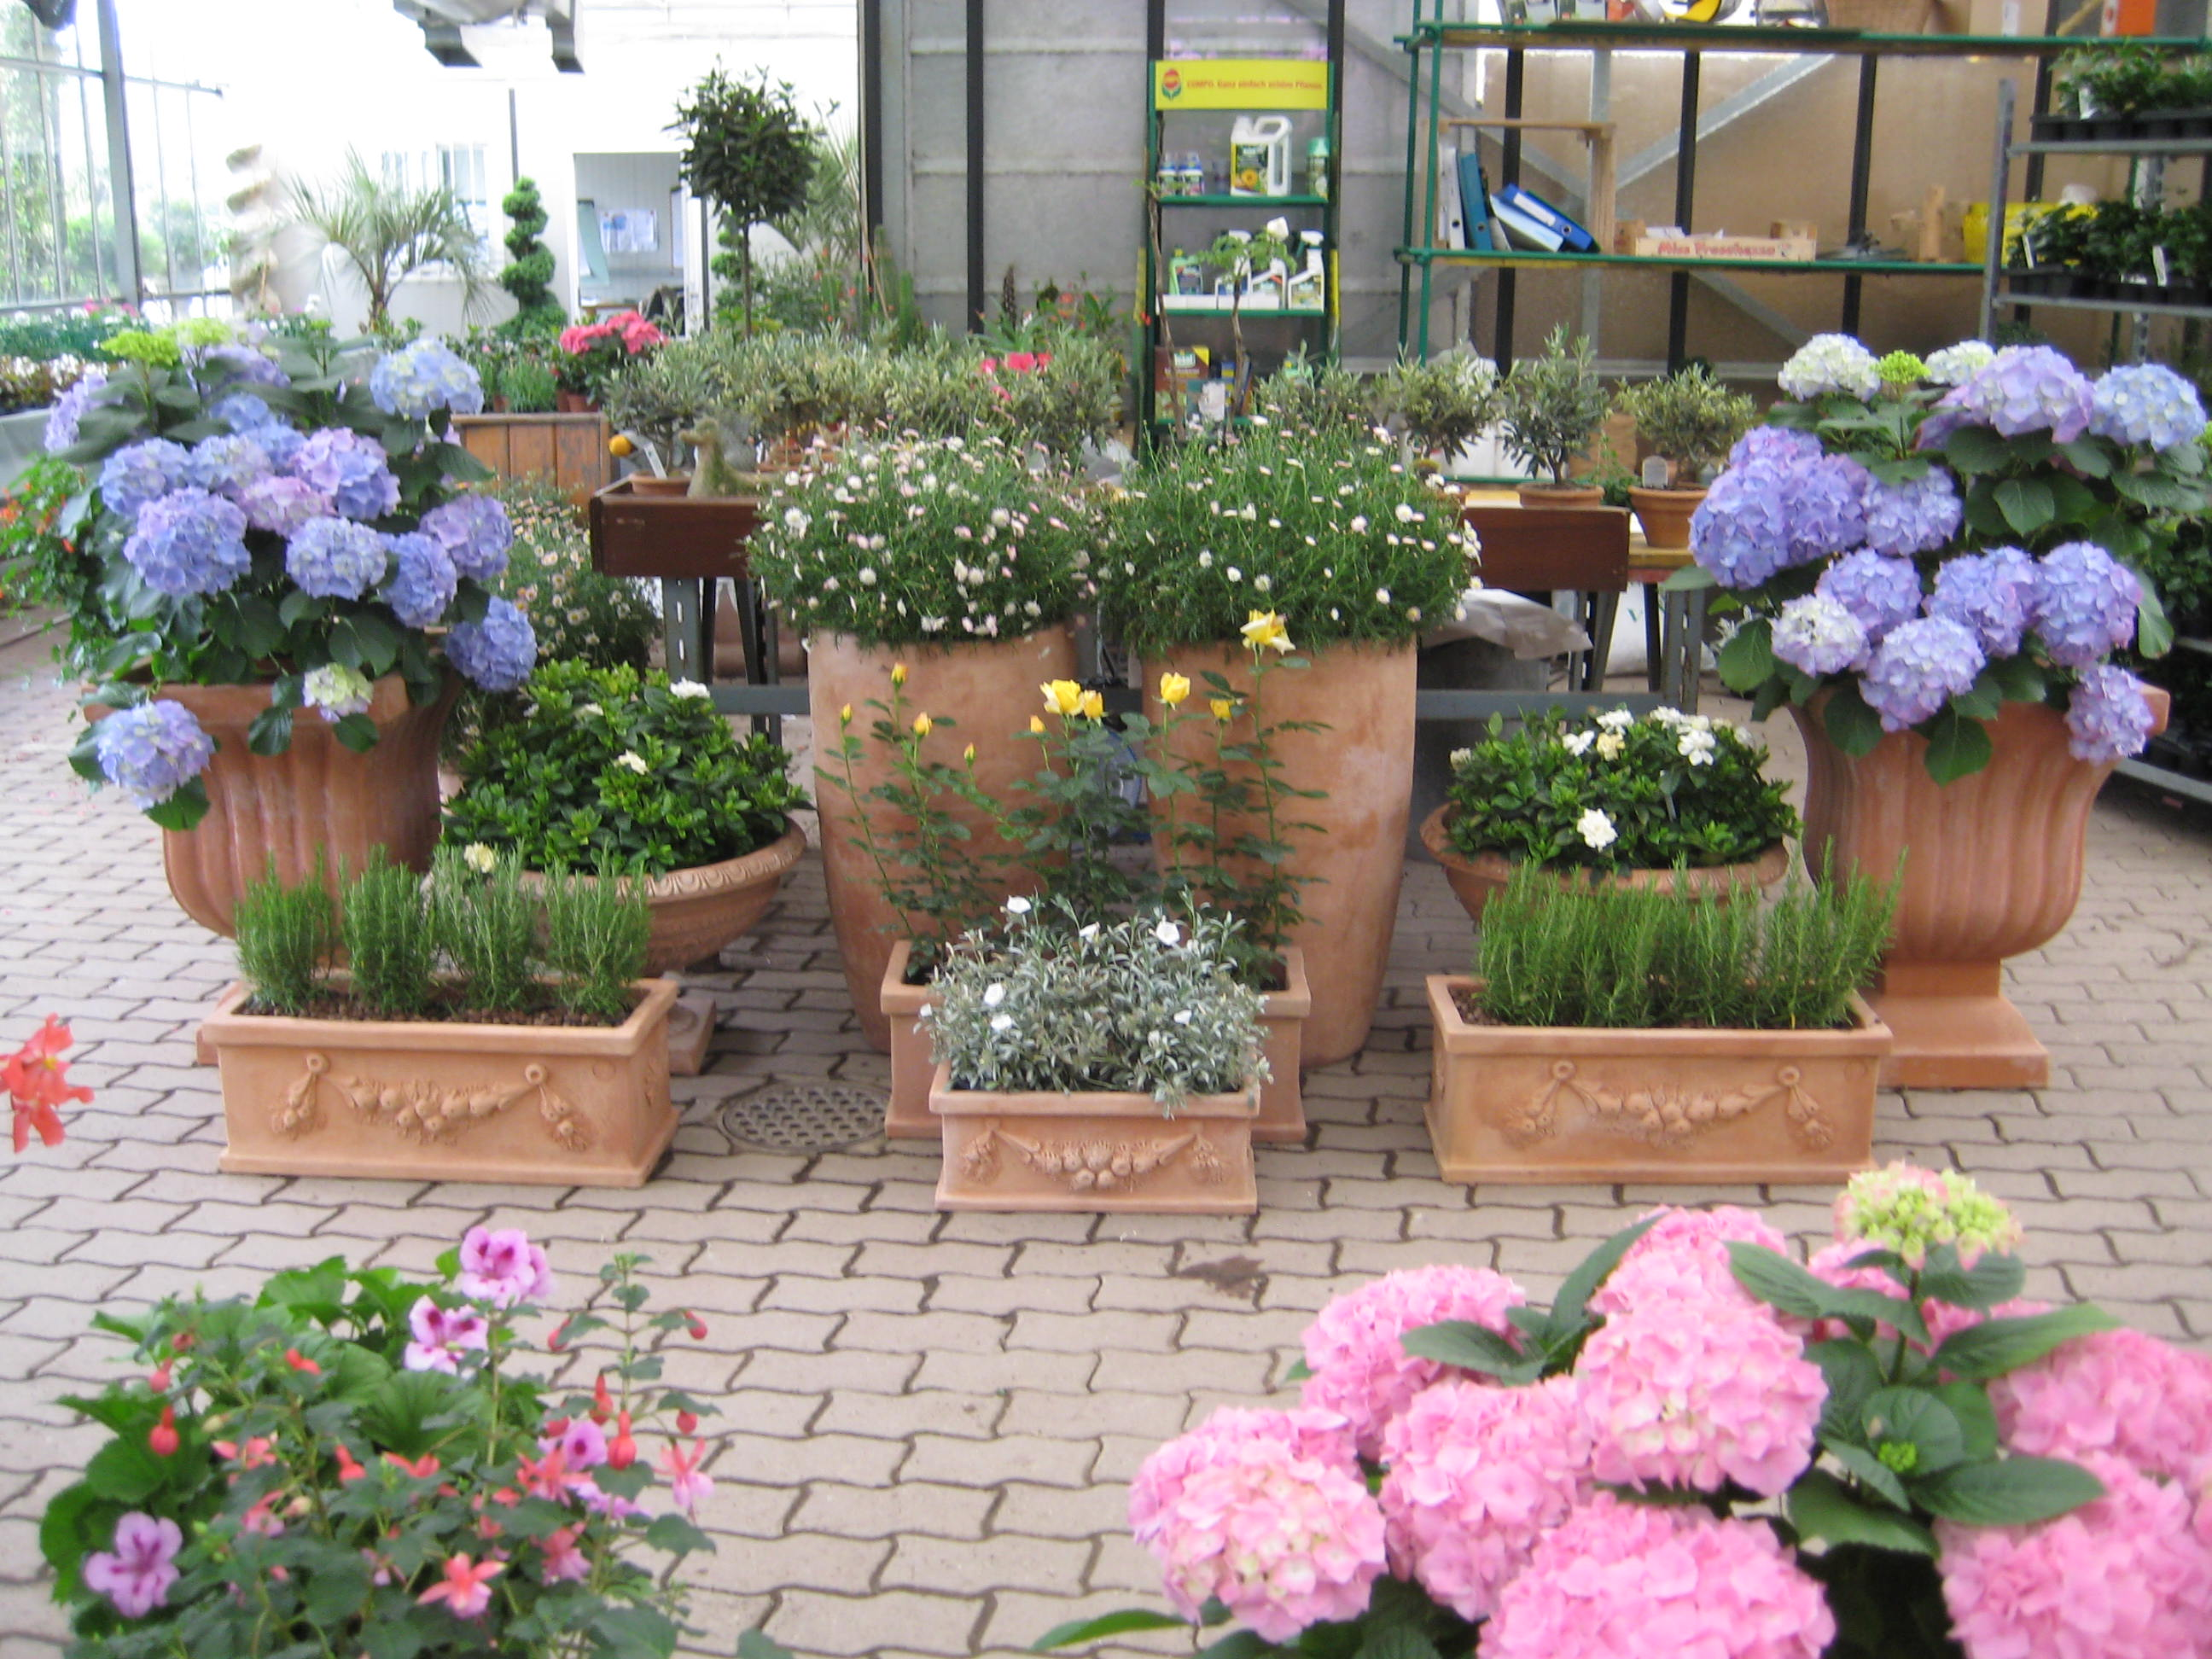 Grano giardini blog archive vasi impruneta for Vasi terracotta prezzi